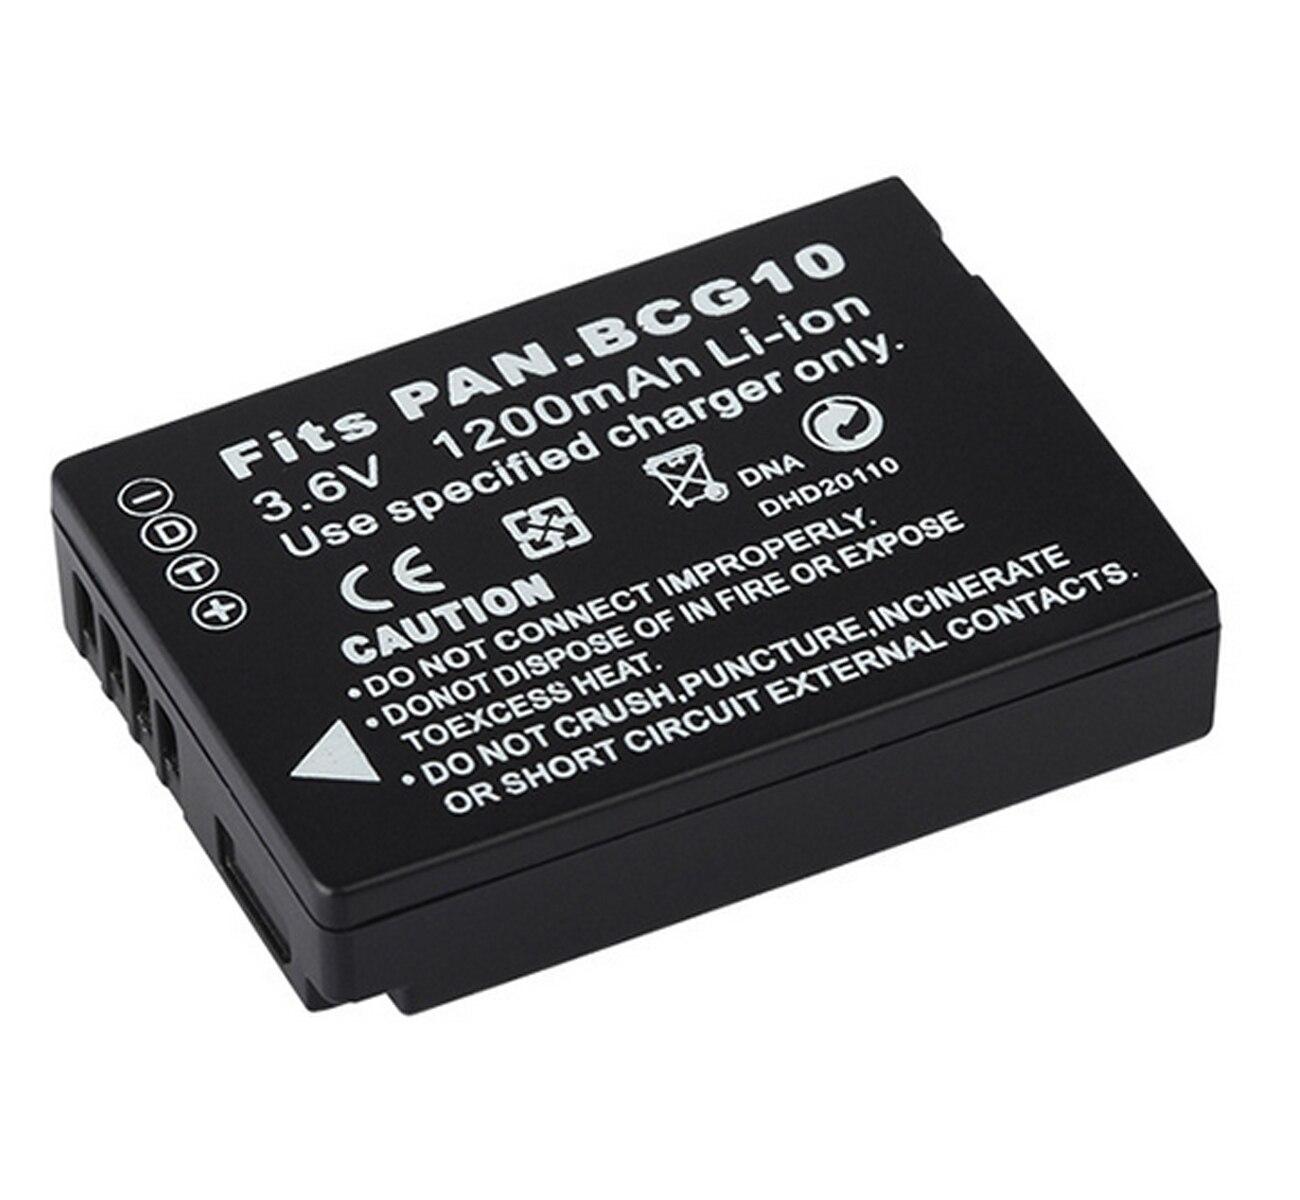 Bateria para panasonic lumix DMC-TZ6, DMC-TZ7, DMC-TZ8, DMC-TZ9, DMC-TZ10, DMC-TZ18, câmera digital